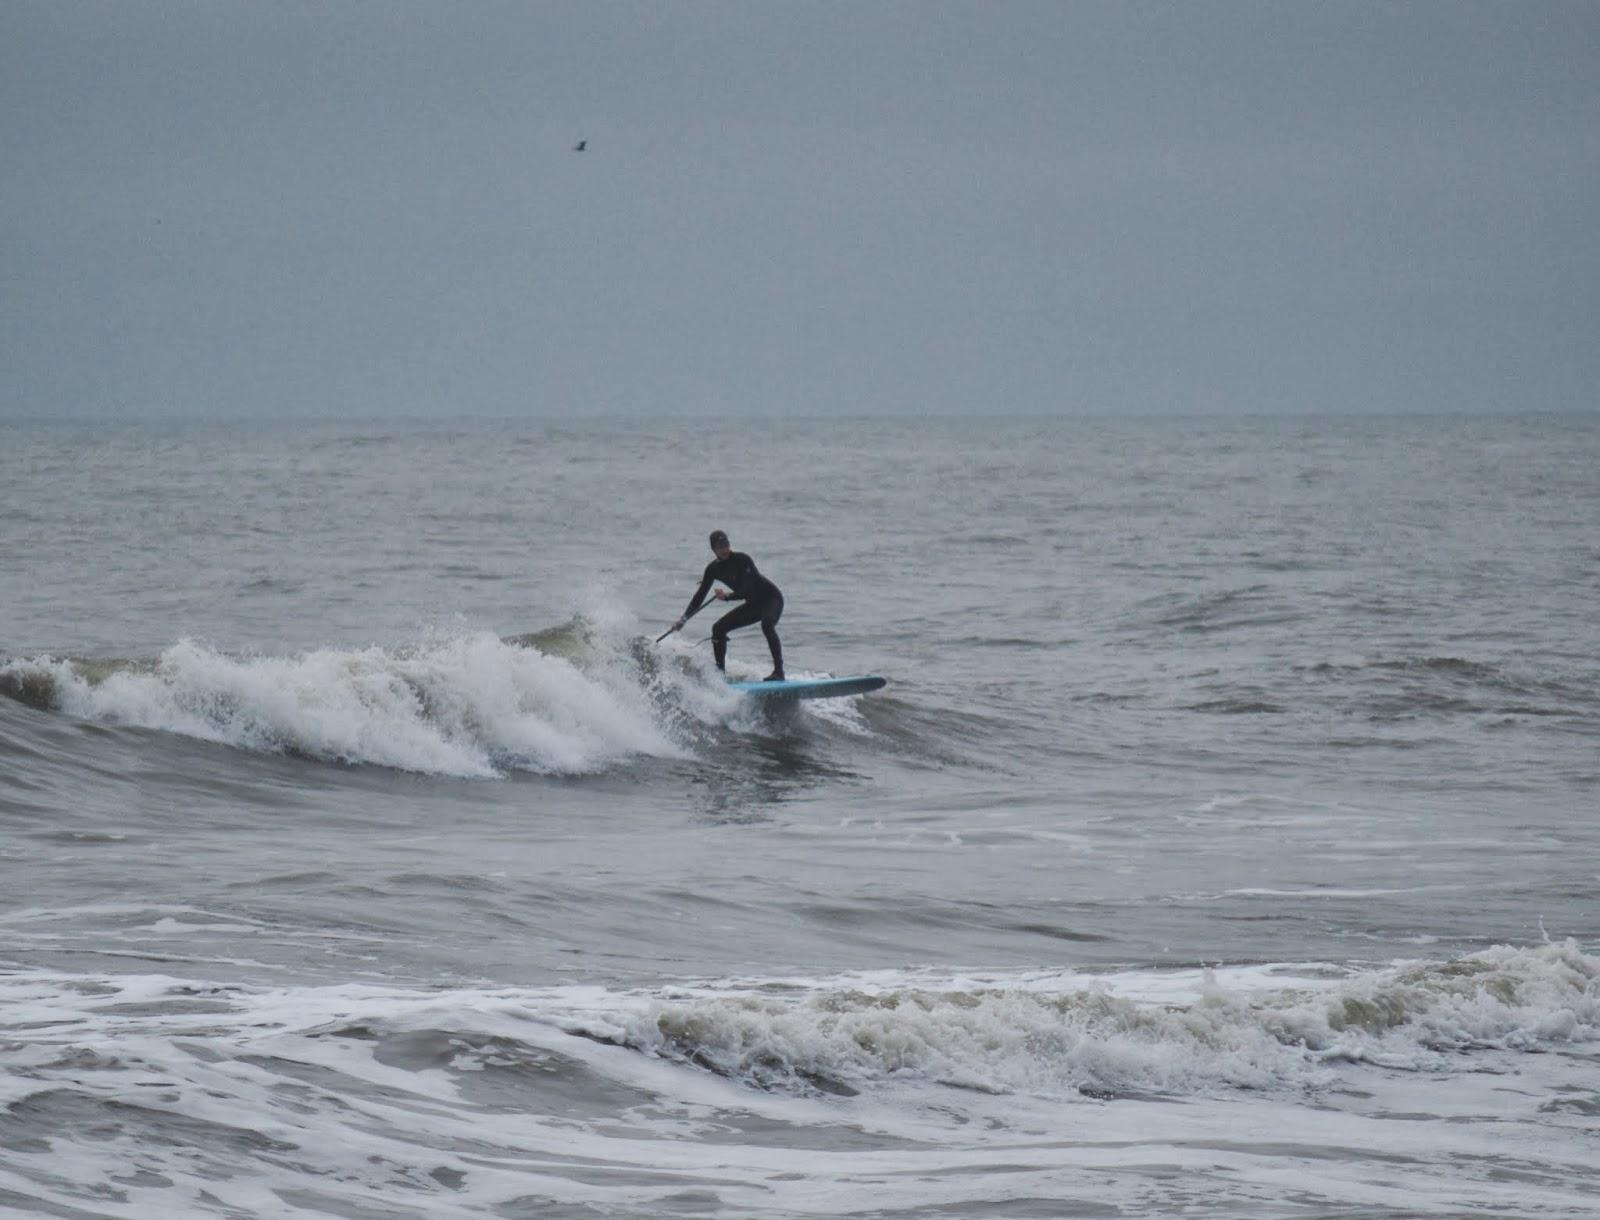 atlantic paddle surfing sup er fun at burkes beach this morning